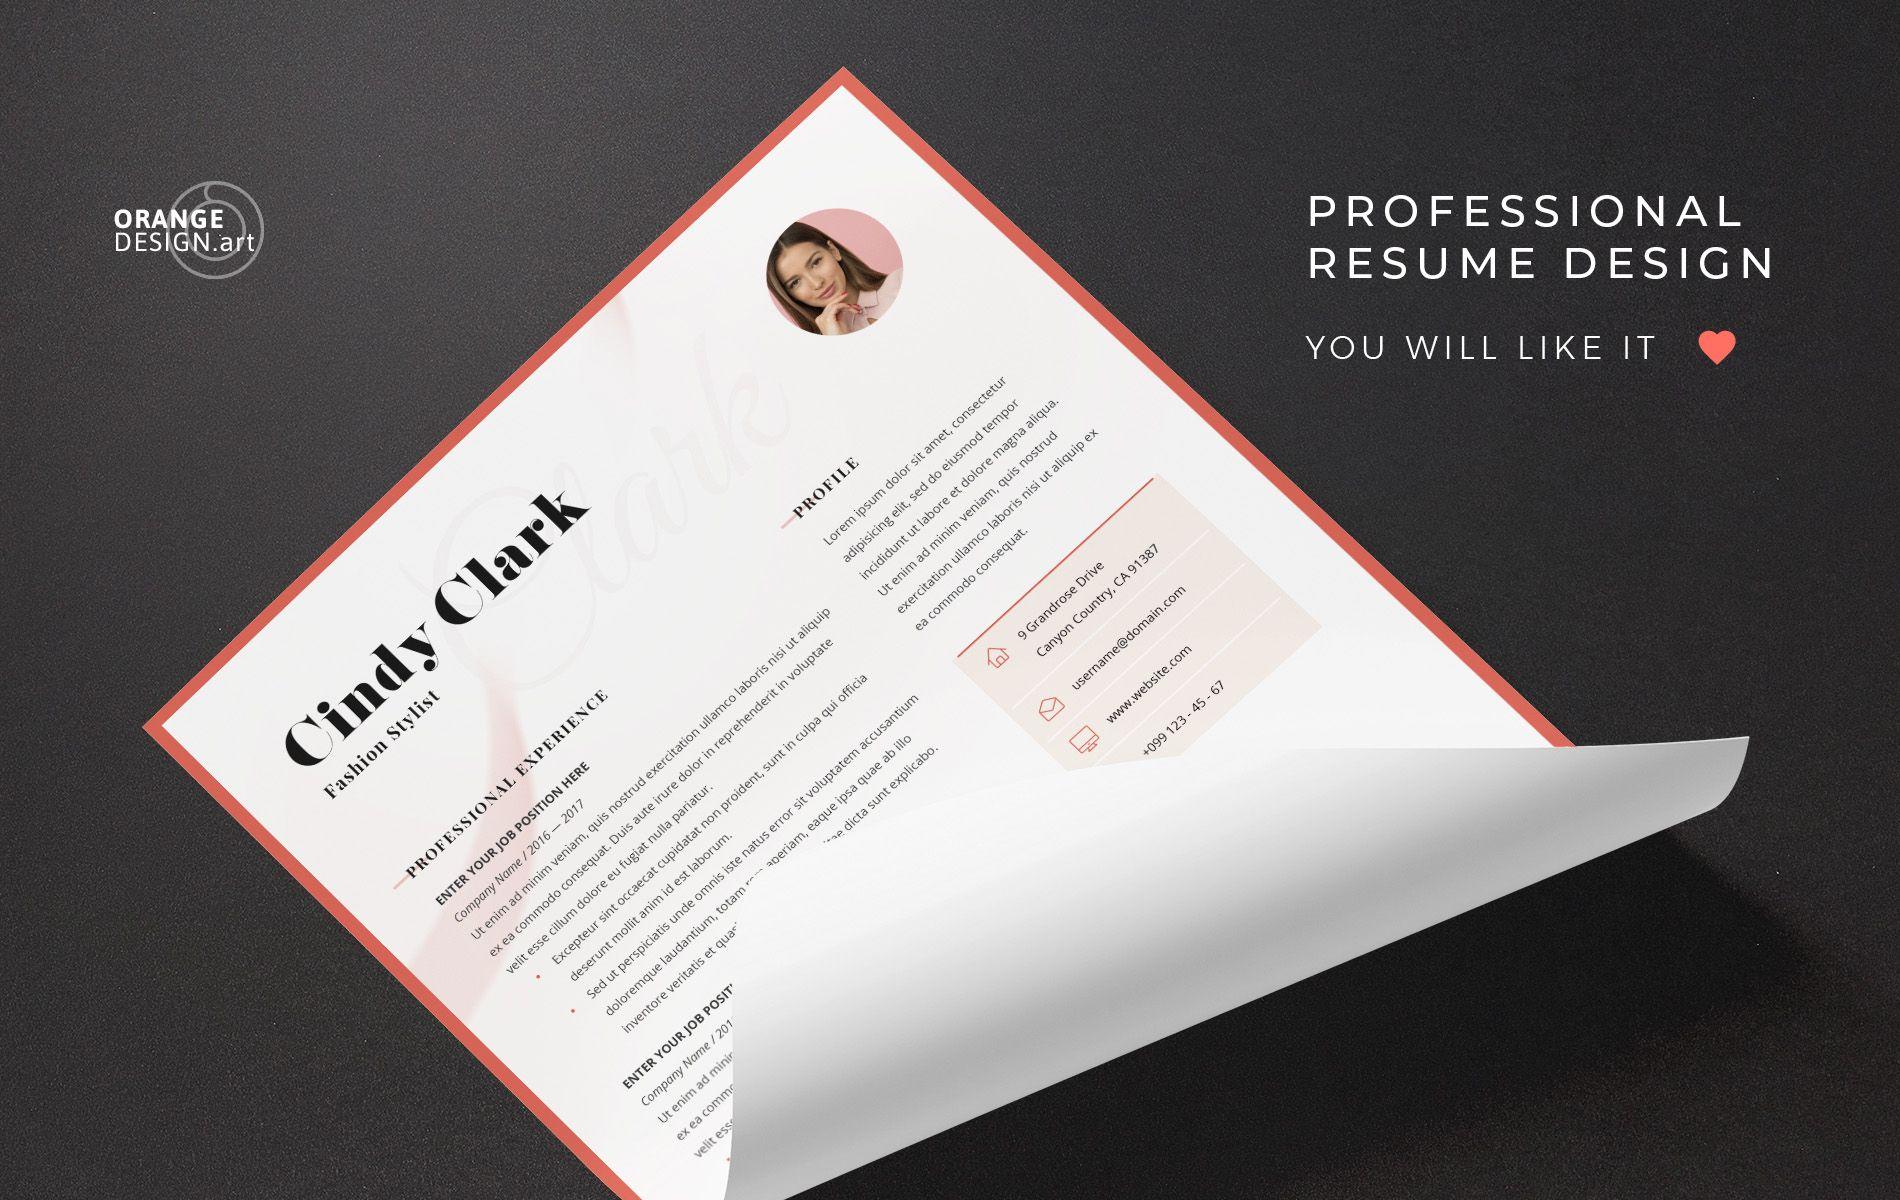 Cindy clark resume template 83188 templates resume